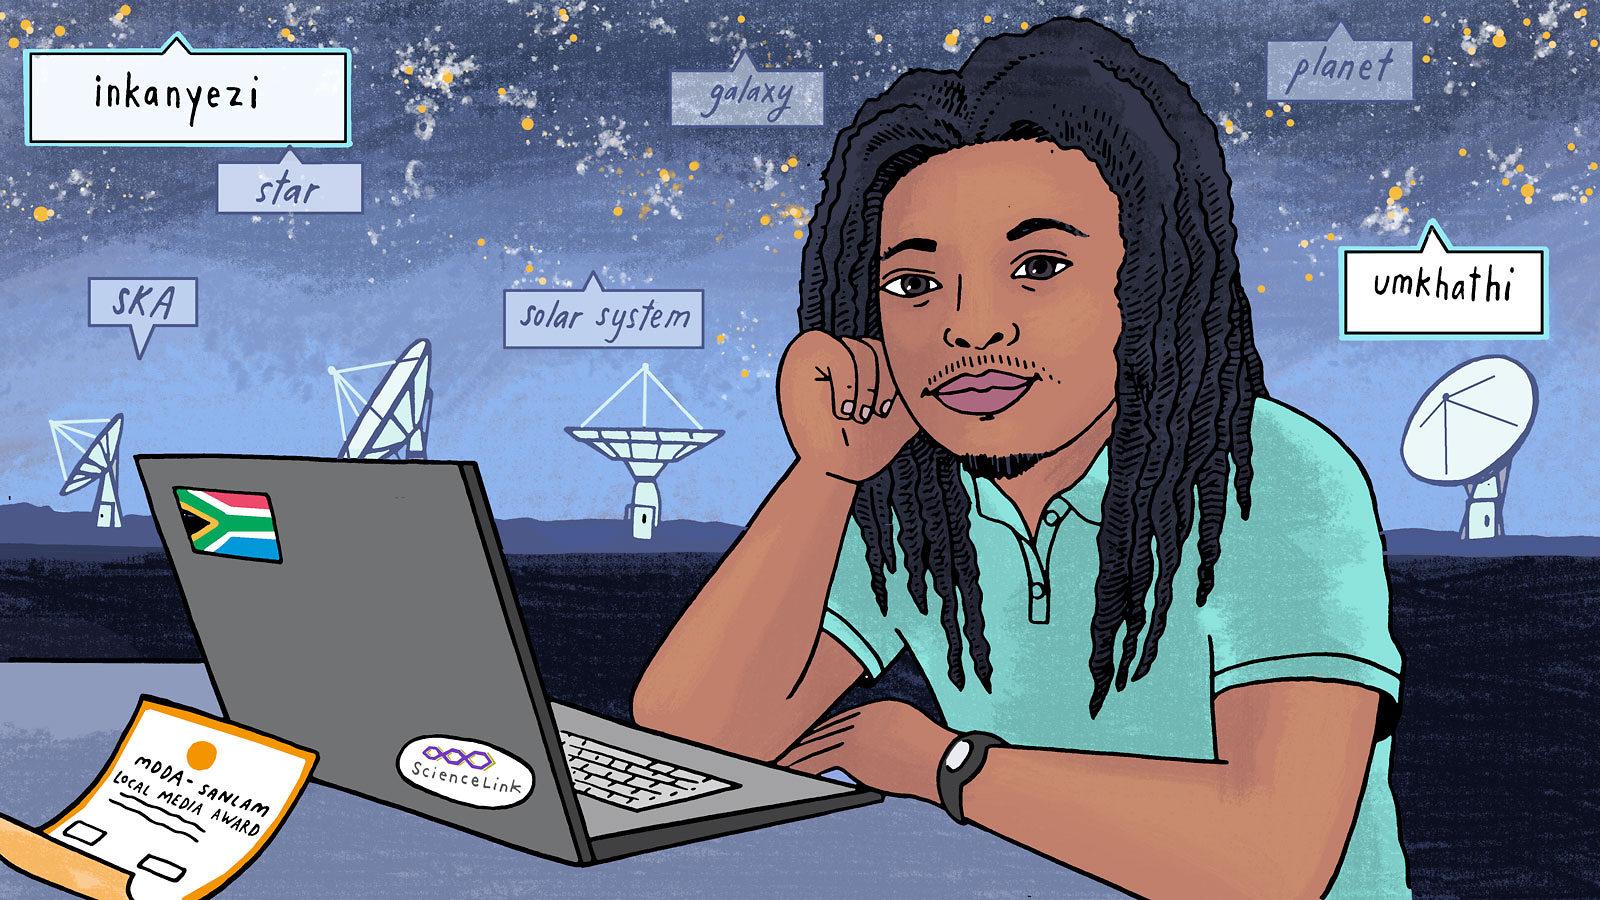 An illustration of Sibusiso Biyela with her laptop